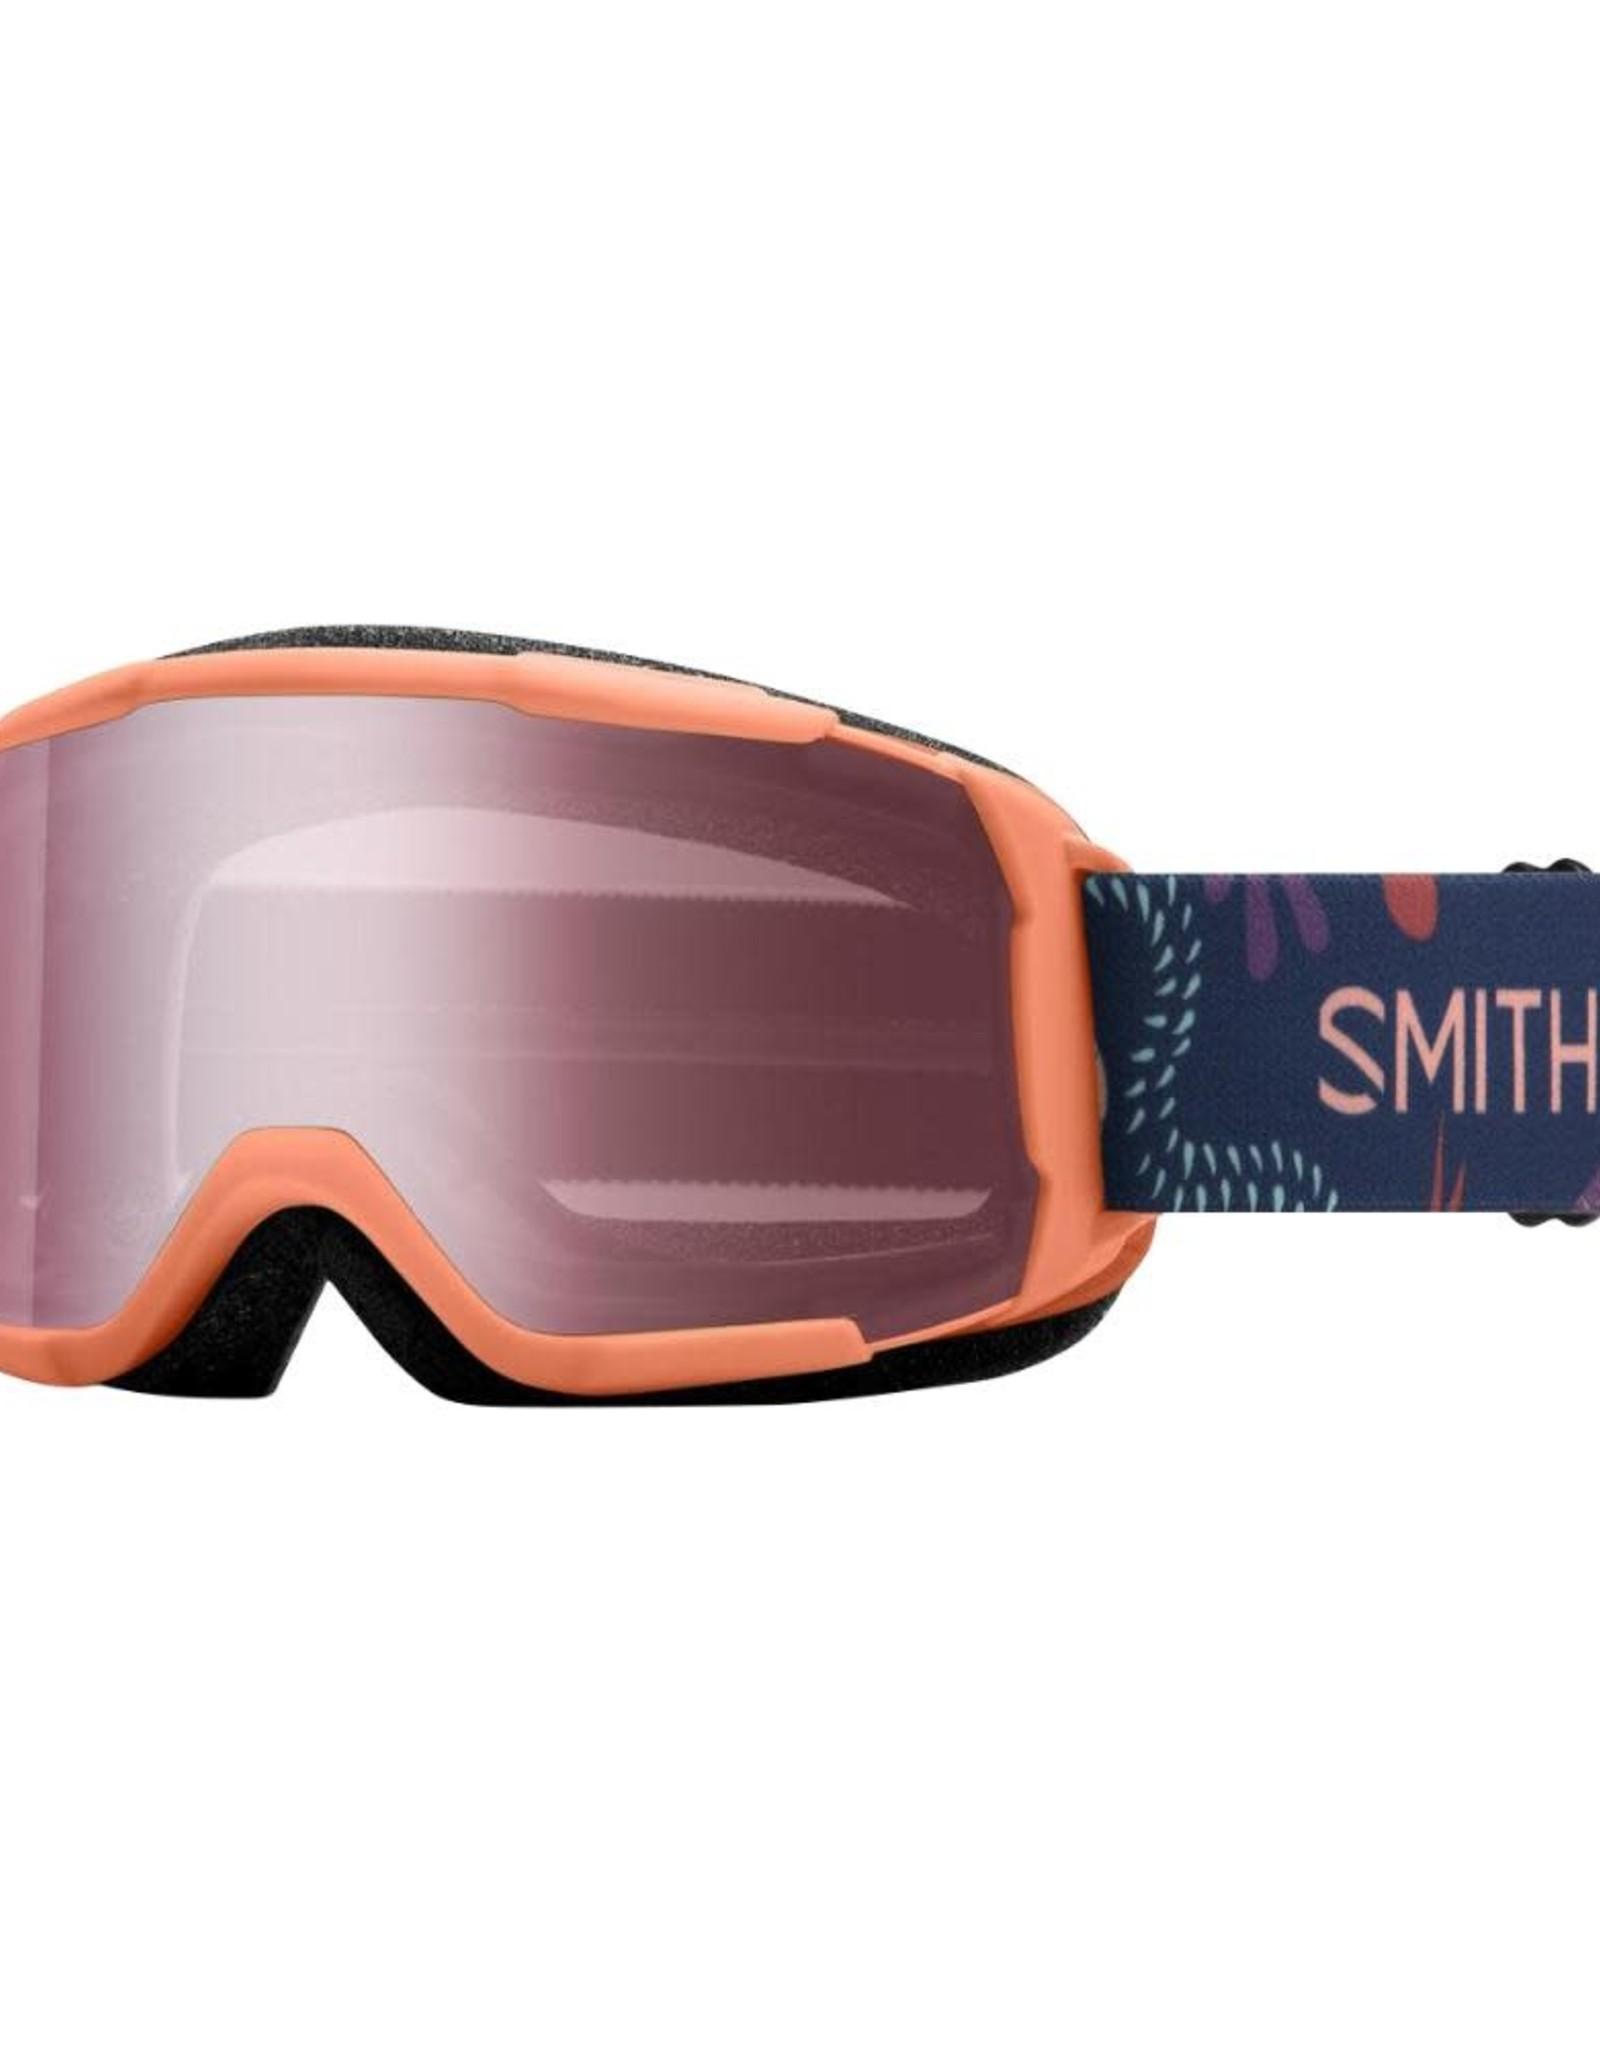 SMITH Smith DareDevil JR with RC36 lenses